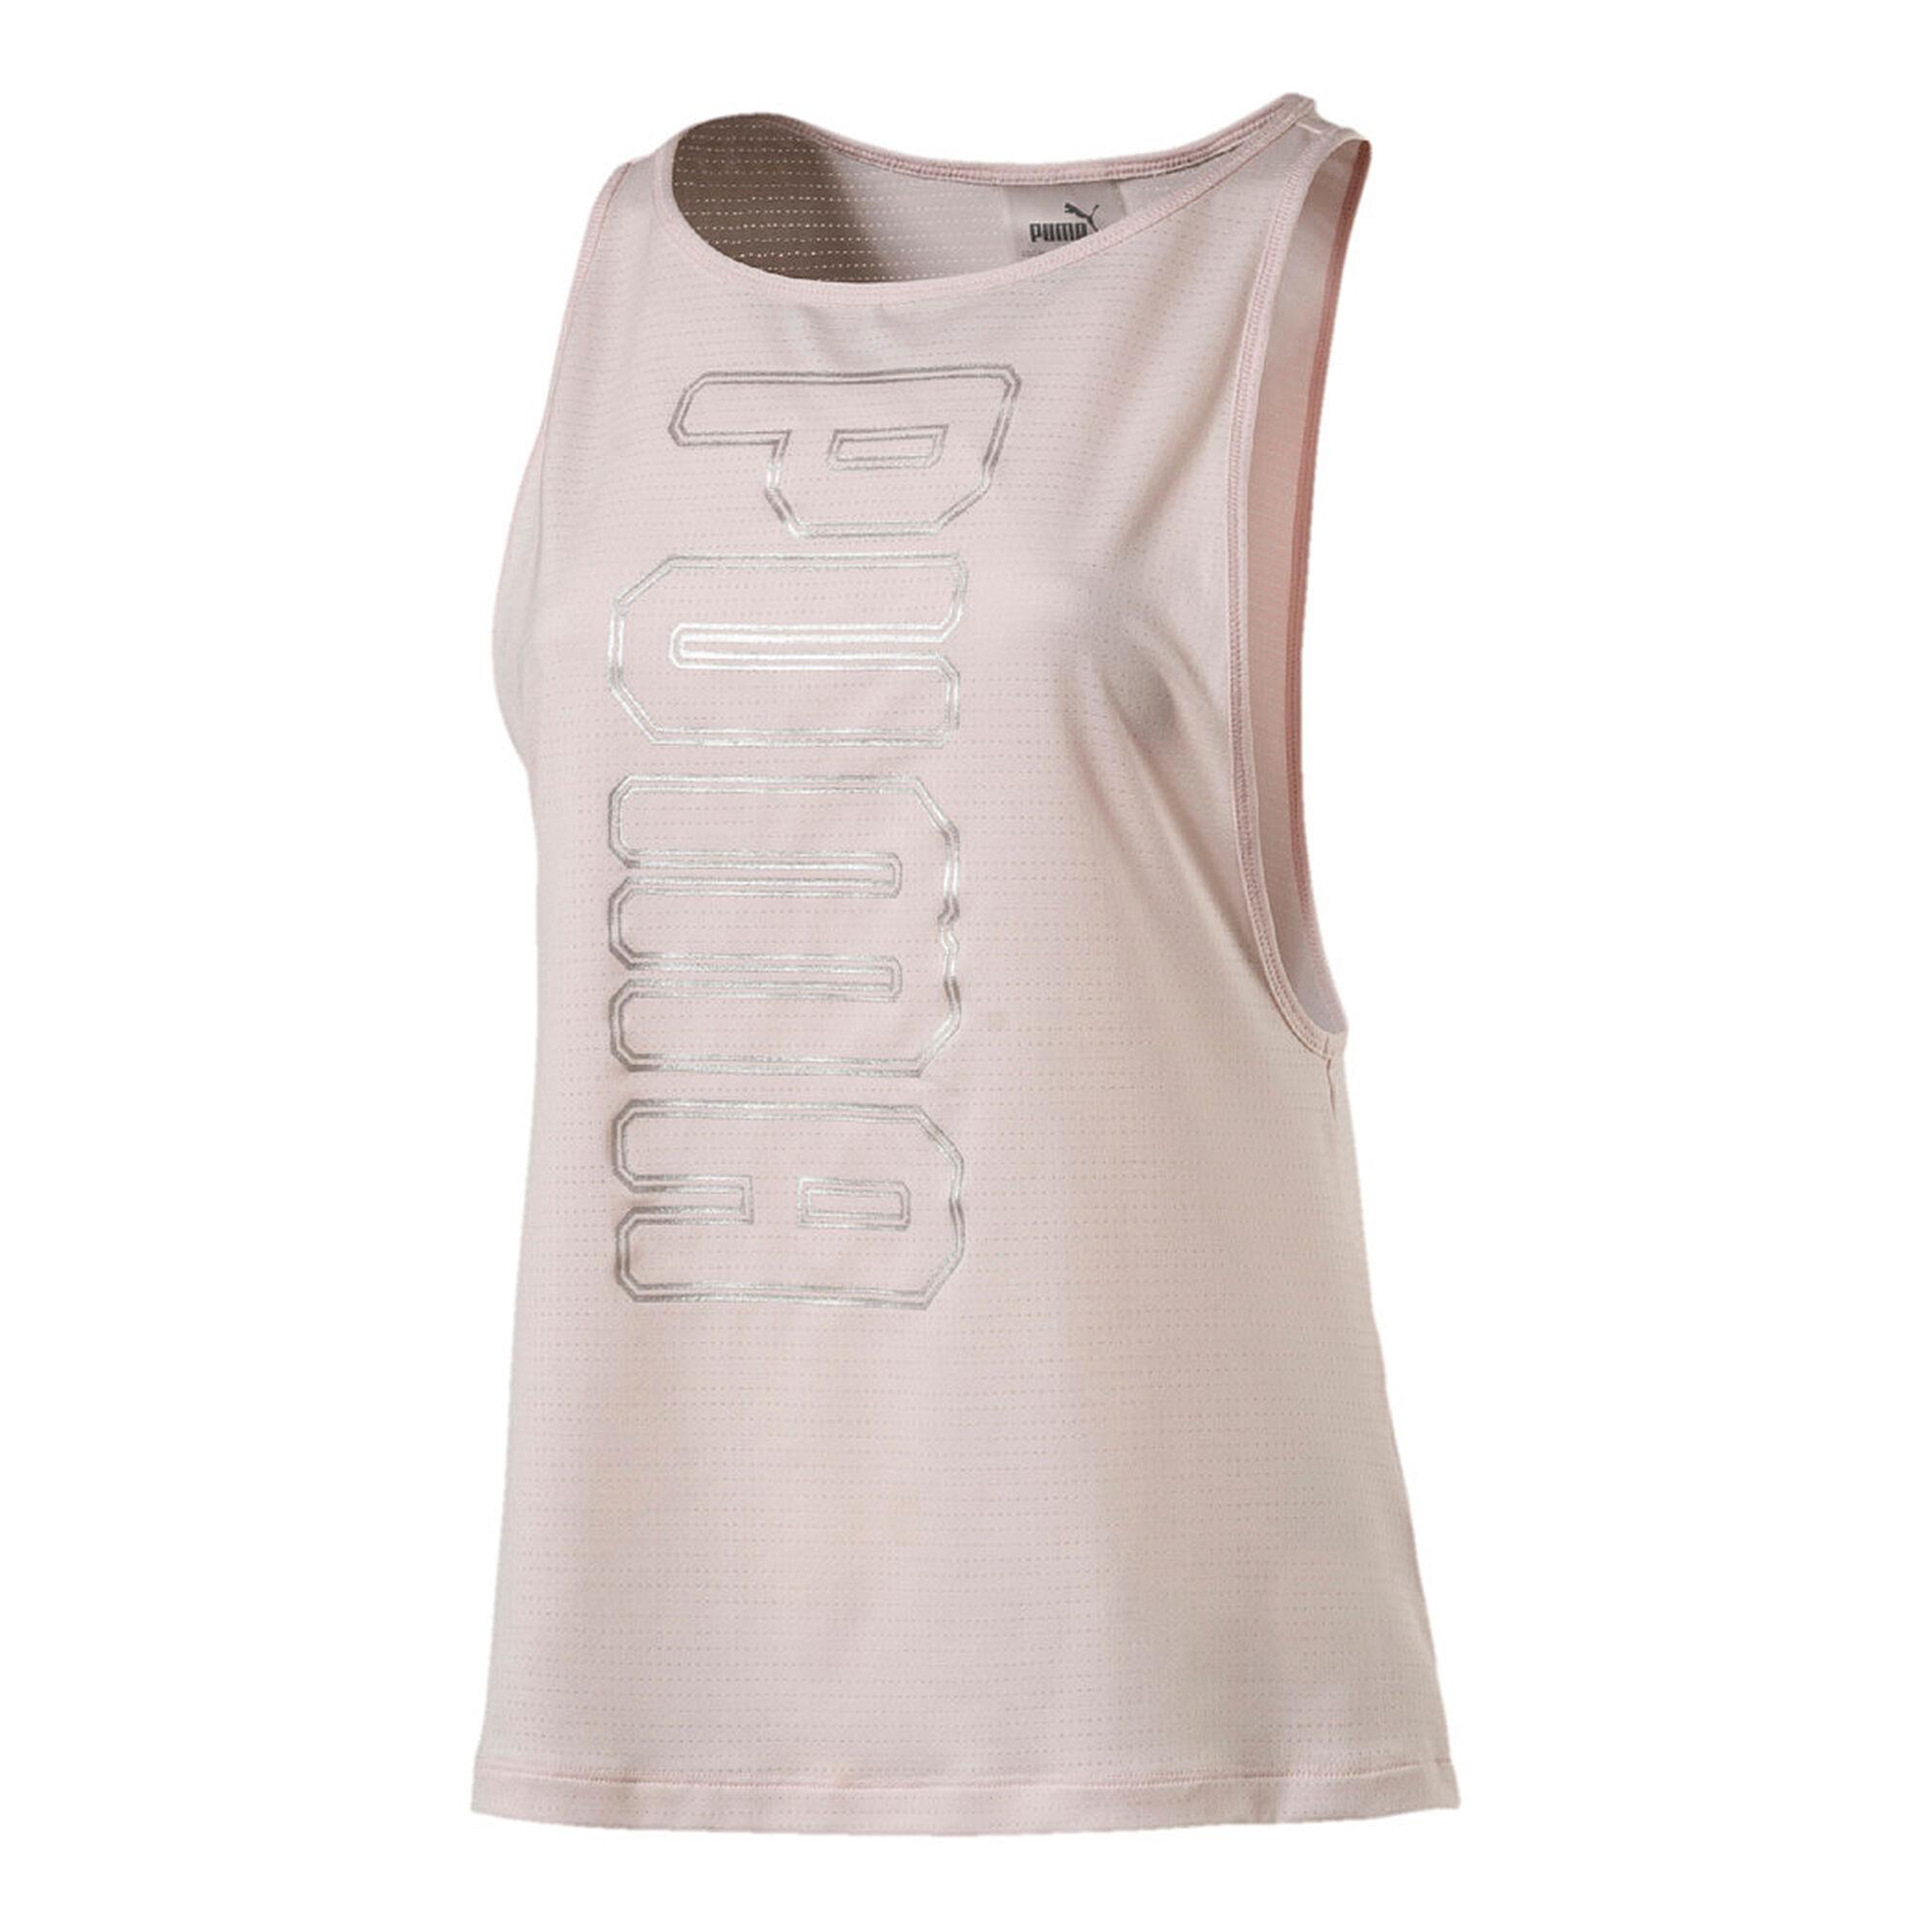 7a059bc11b94 buy Puma Spark Tank Top Women - Pink